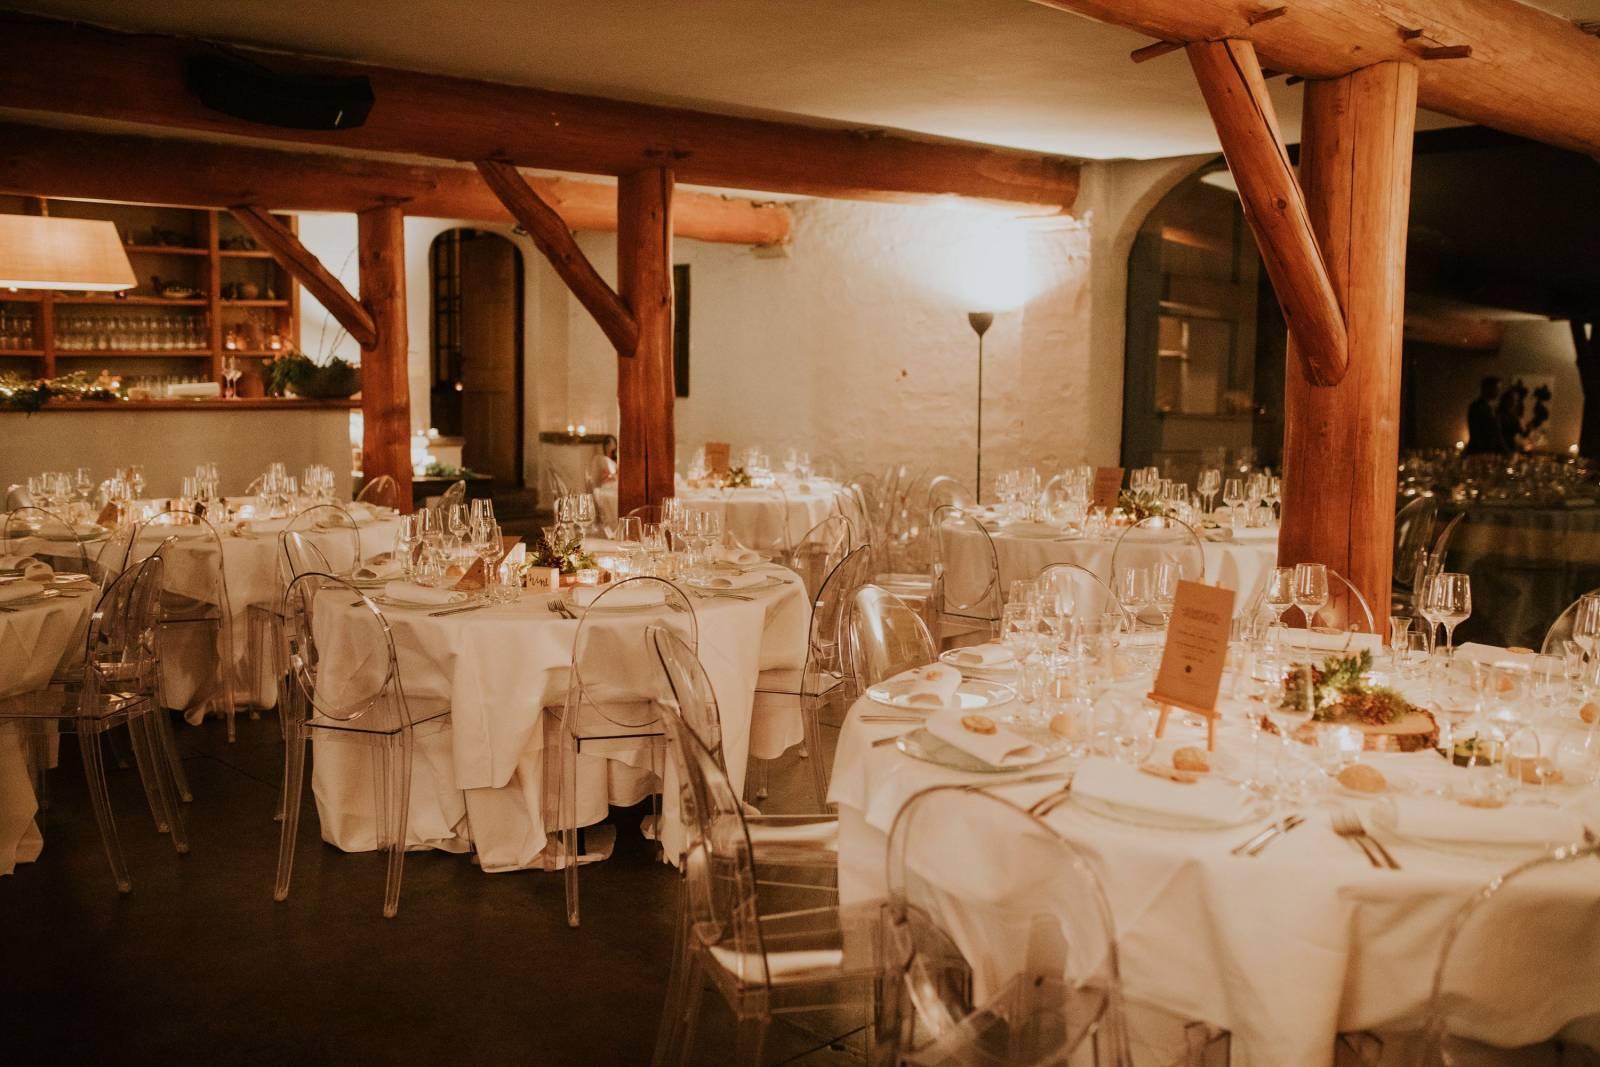 Flinckheuvel - Feestzaal 's Gravenwezel -  House of Weddings - 9